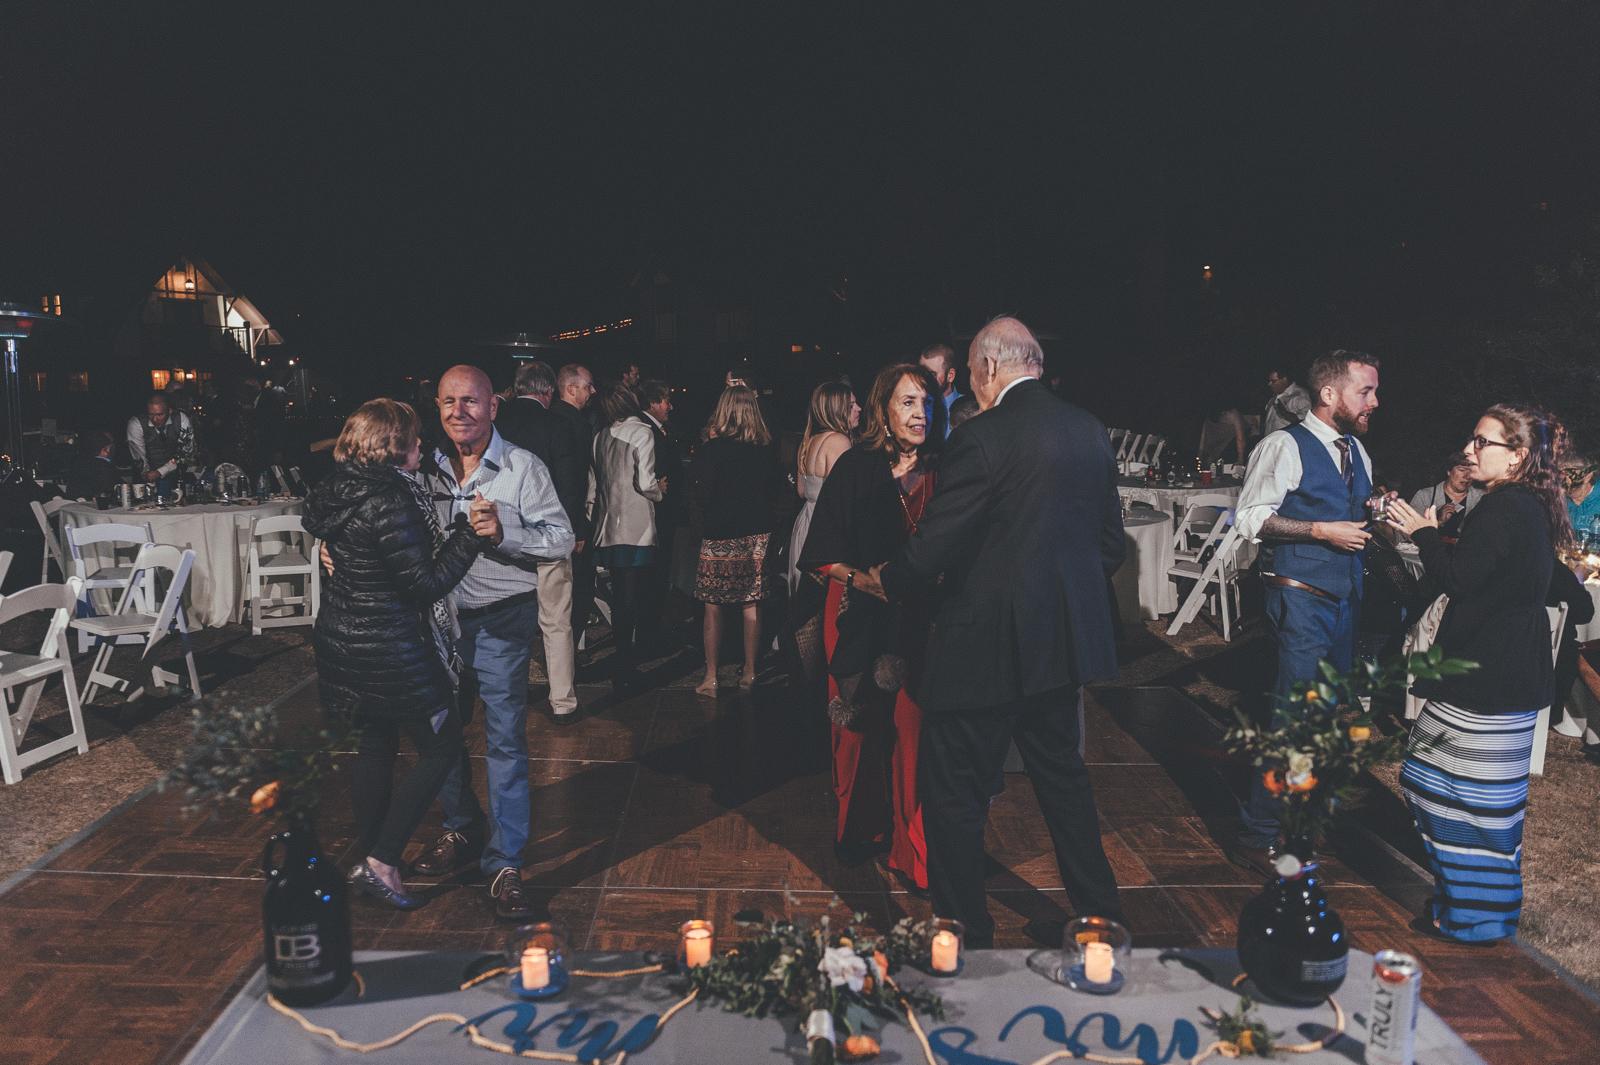 ChadFahnestockPhotography-estes-park-wedding-photography-061.jpg